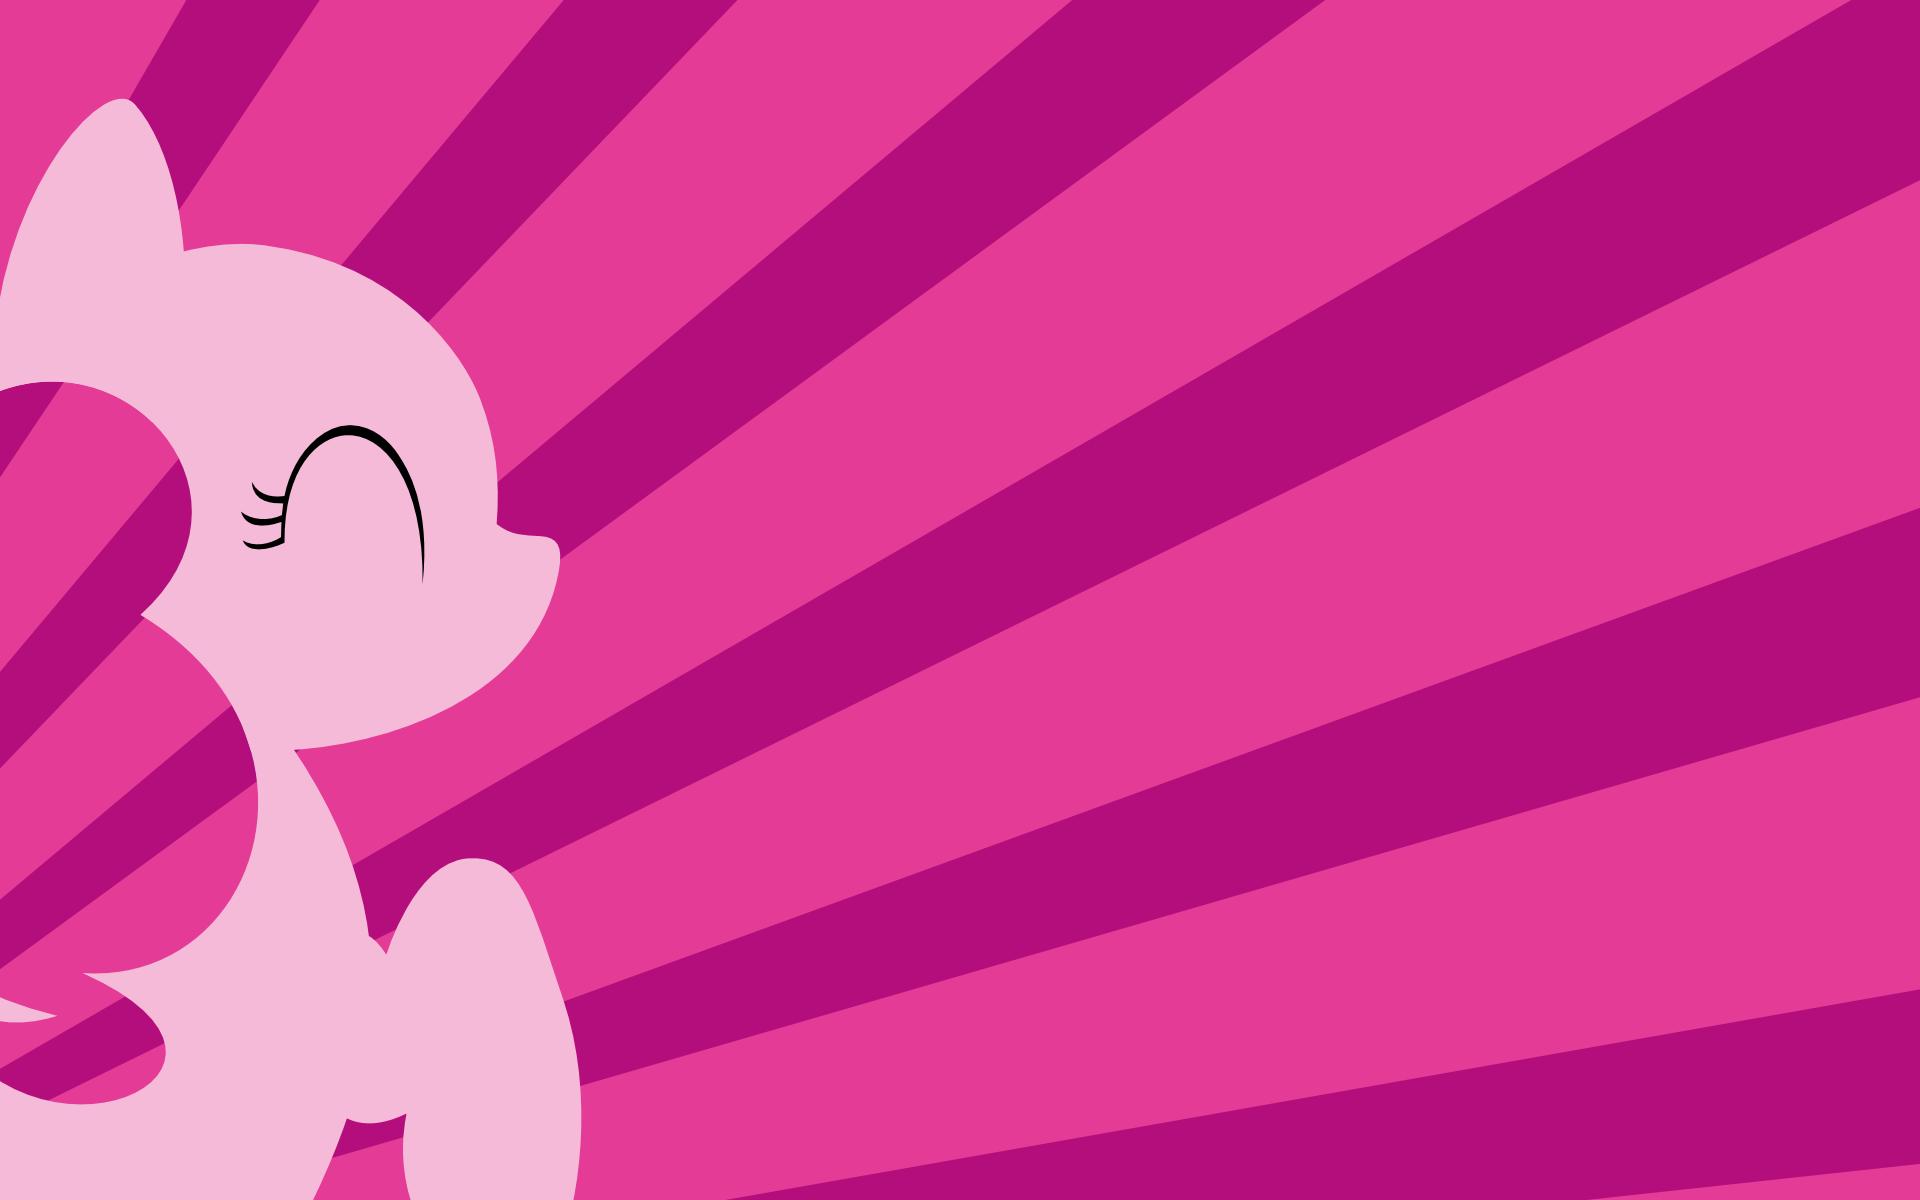 Pinkie Pie karatasi la kupamba ukuta